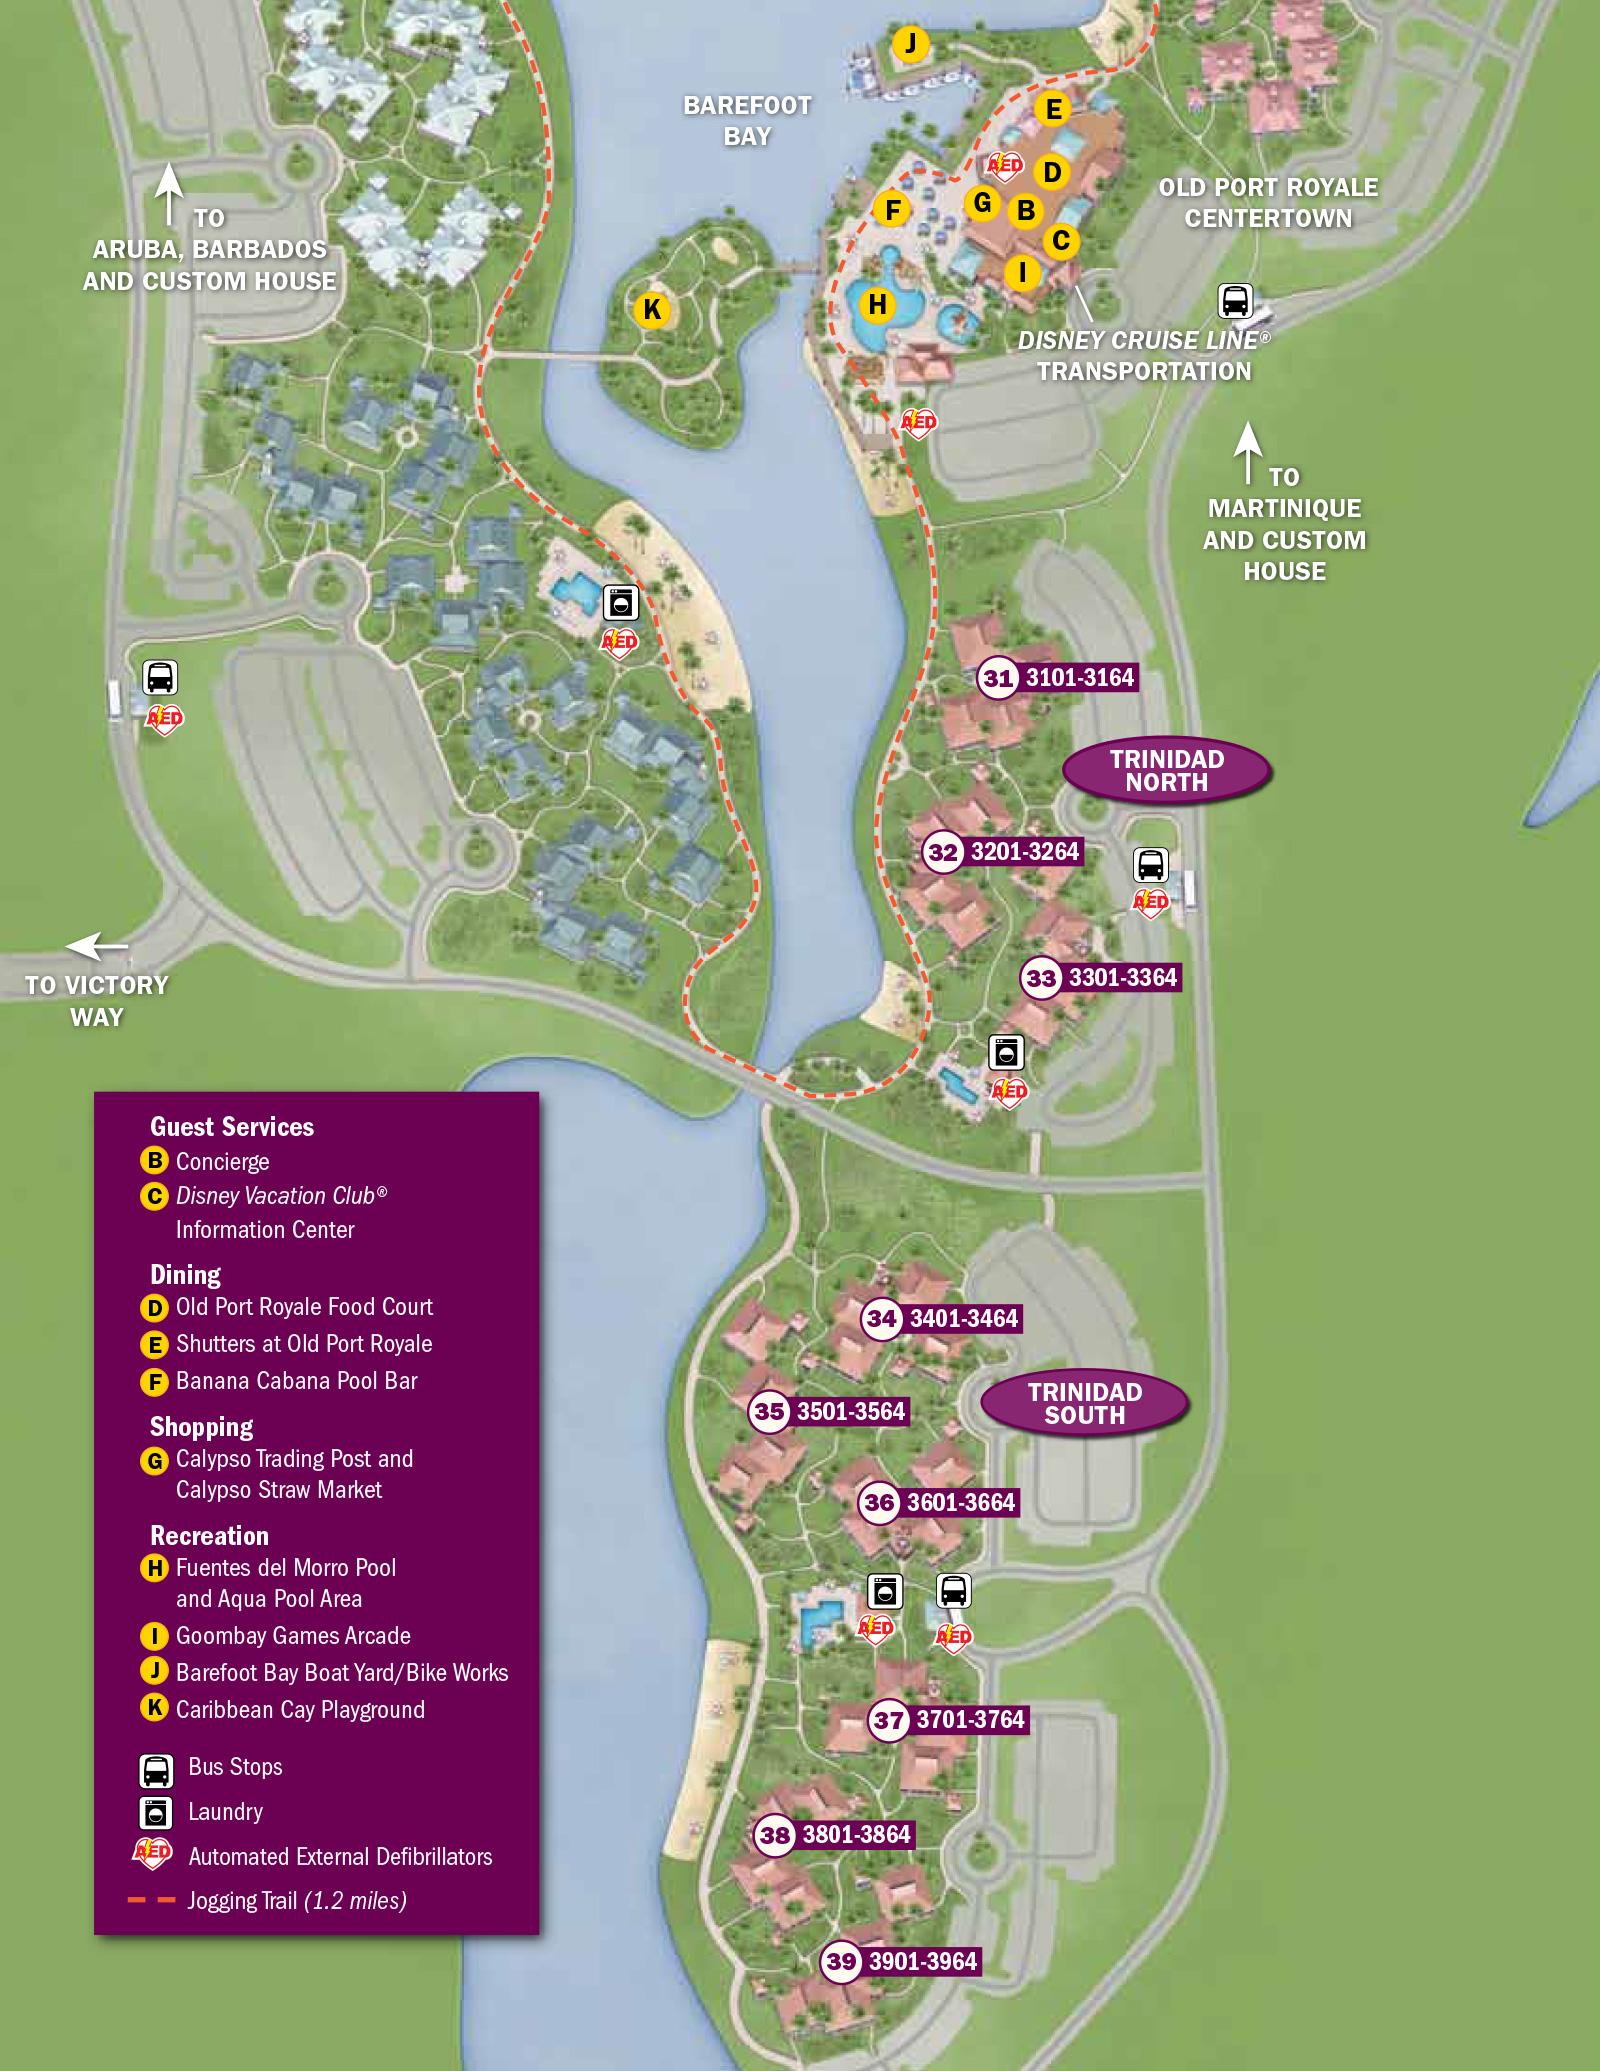 2013 Caribbean Beach Resort guide map  Photo 6 of 6